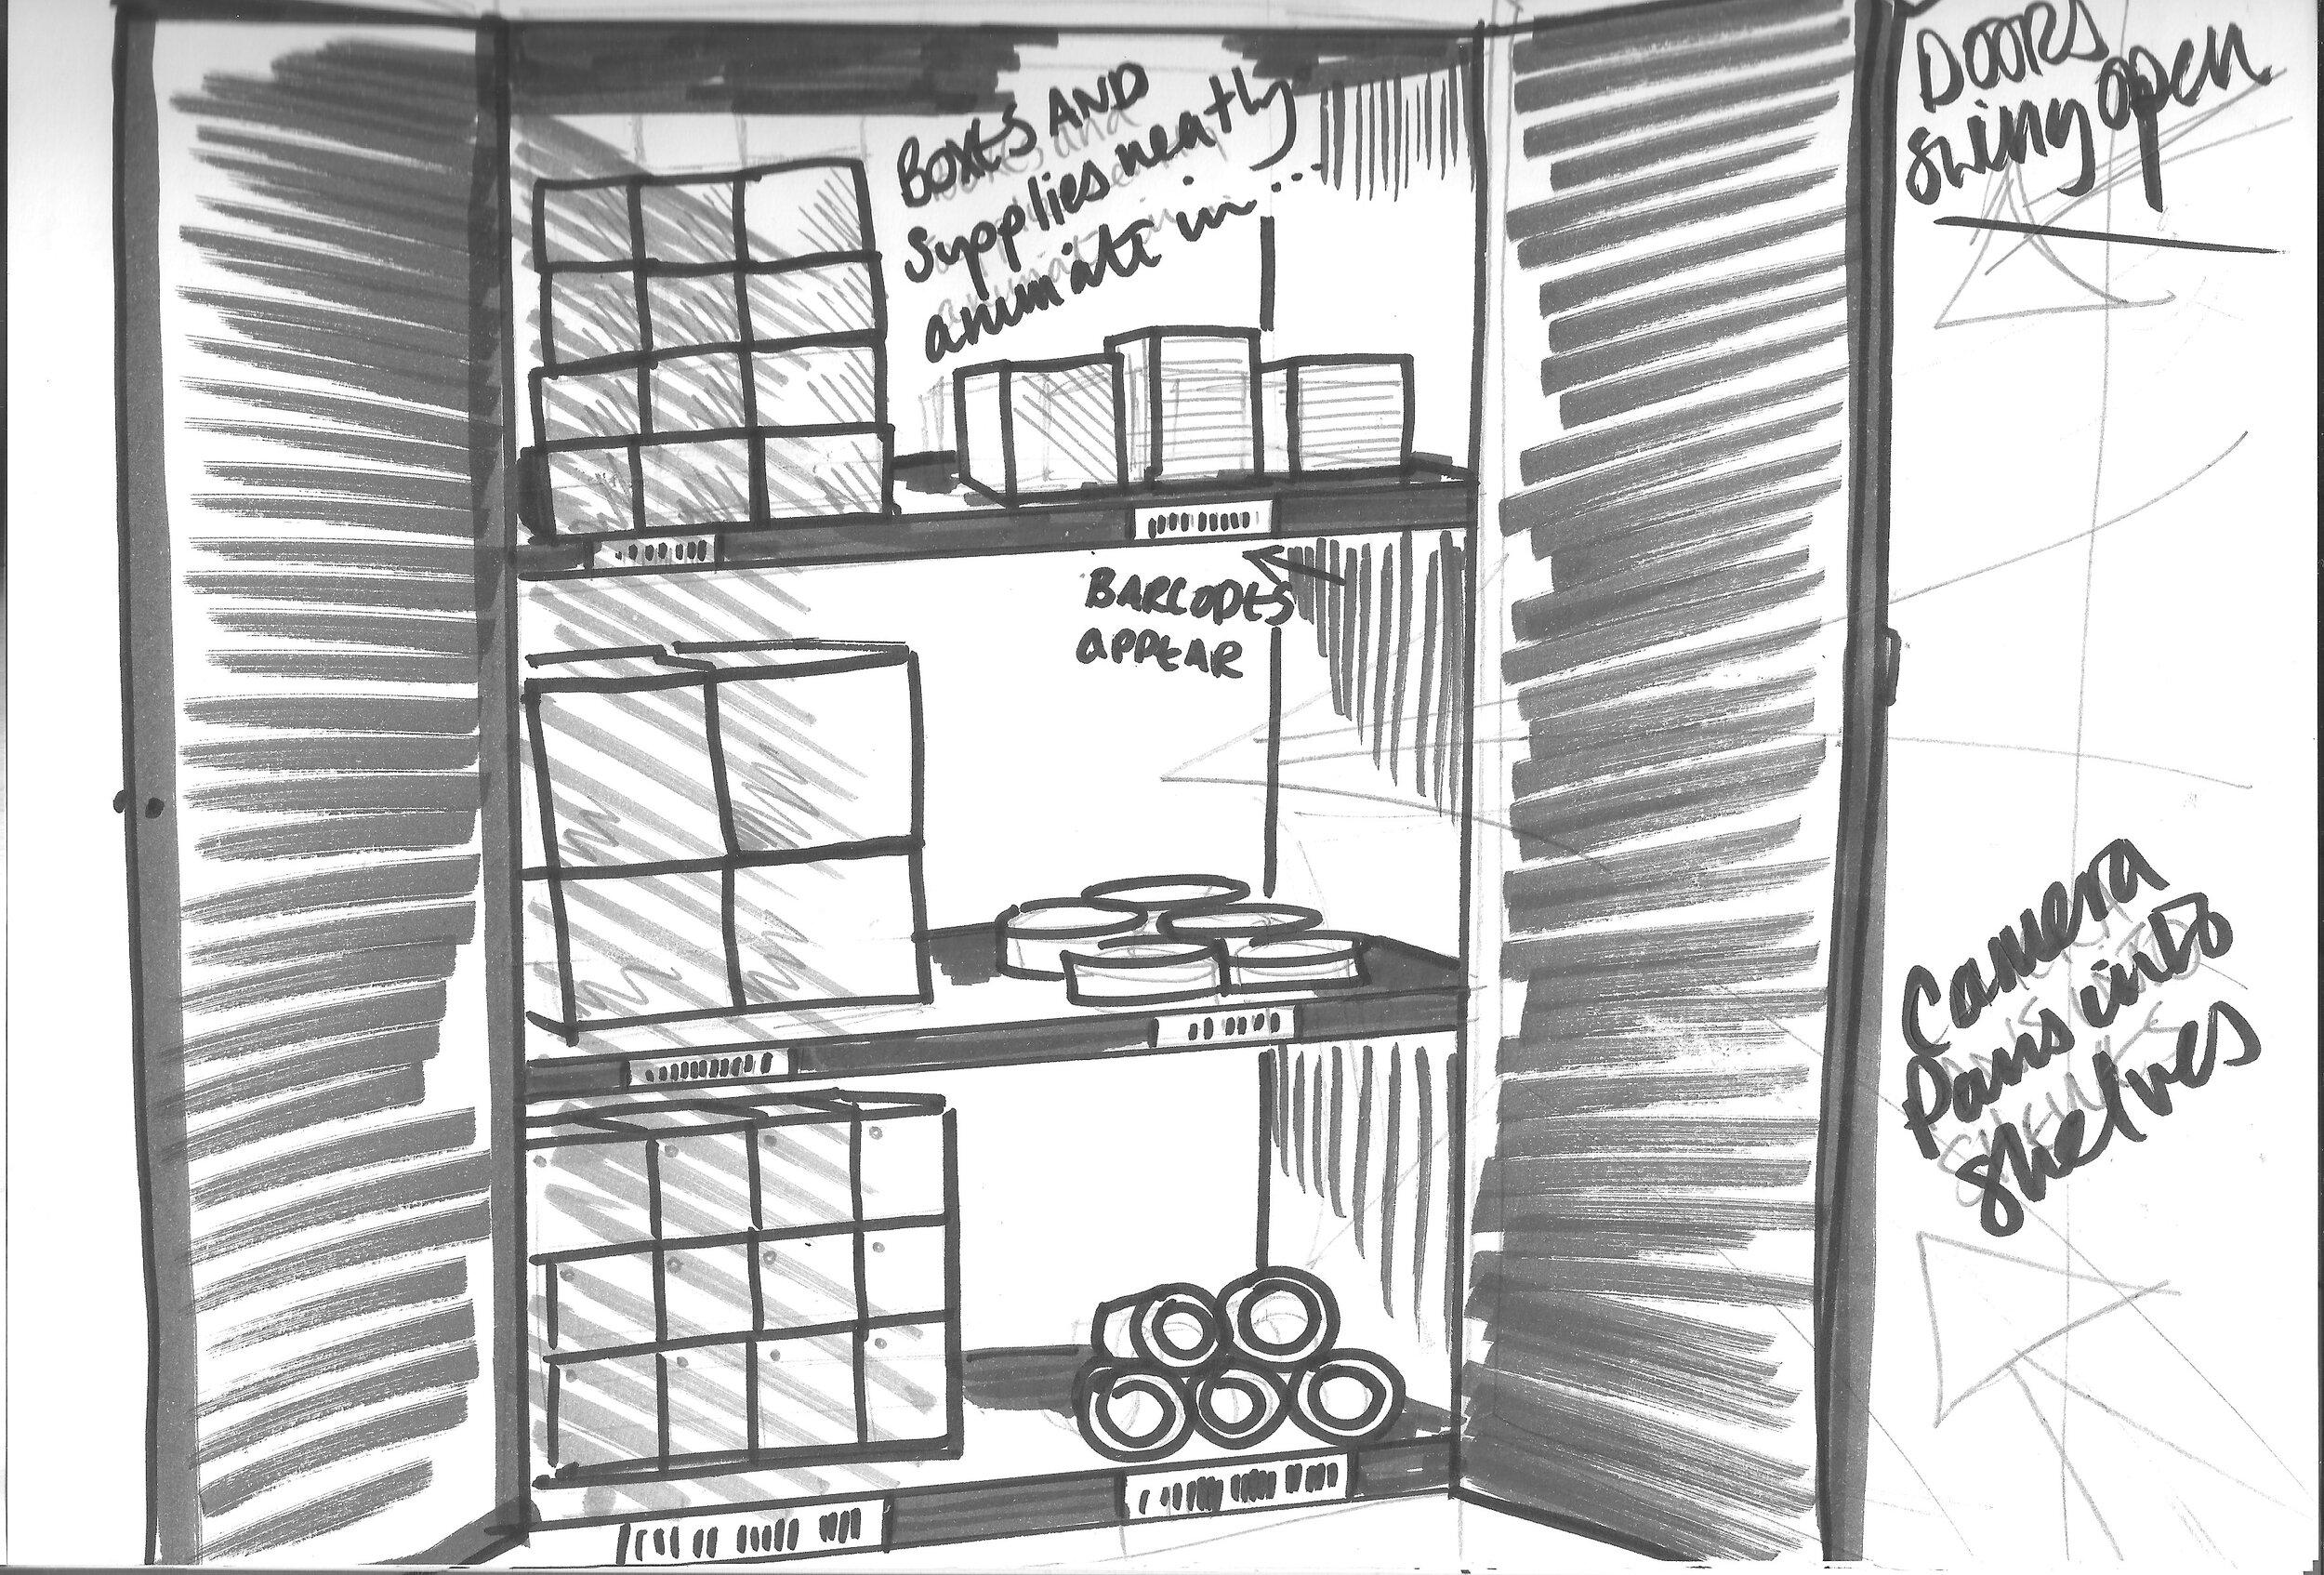 PANNING INTO SHELVES 01.jpg